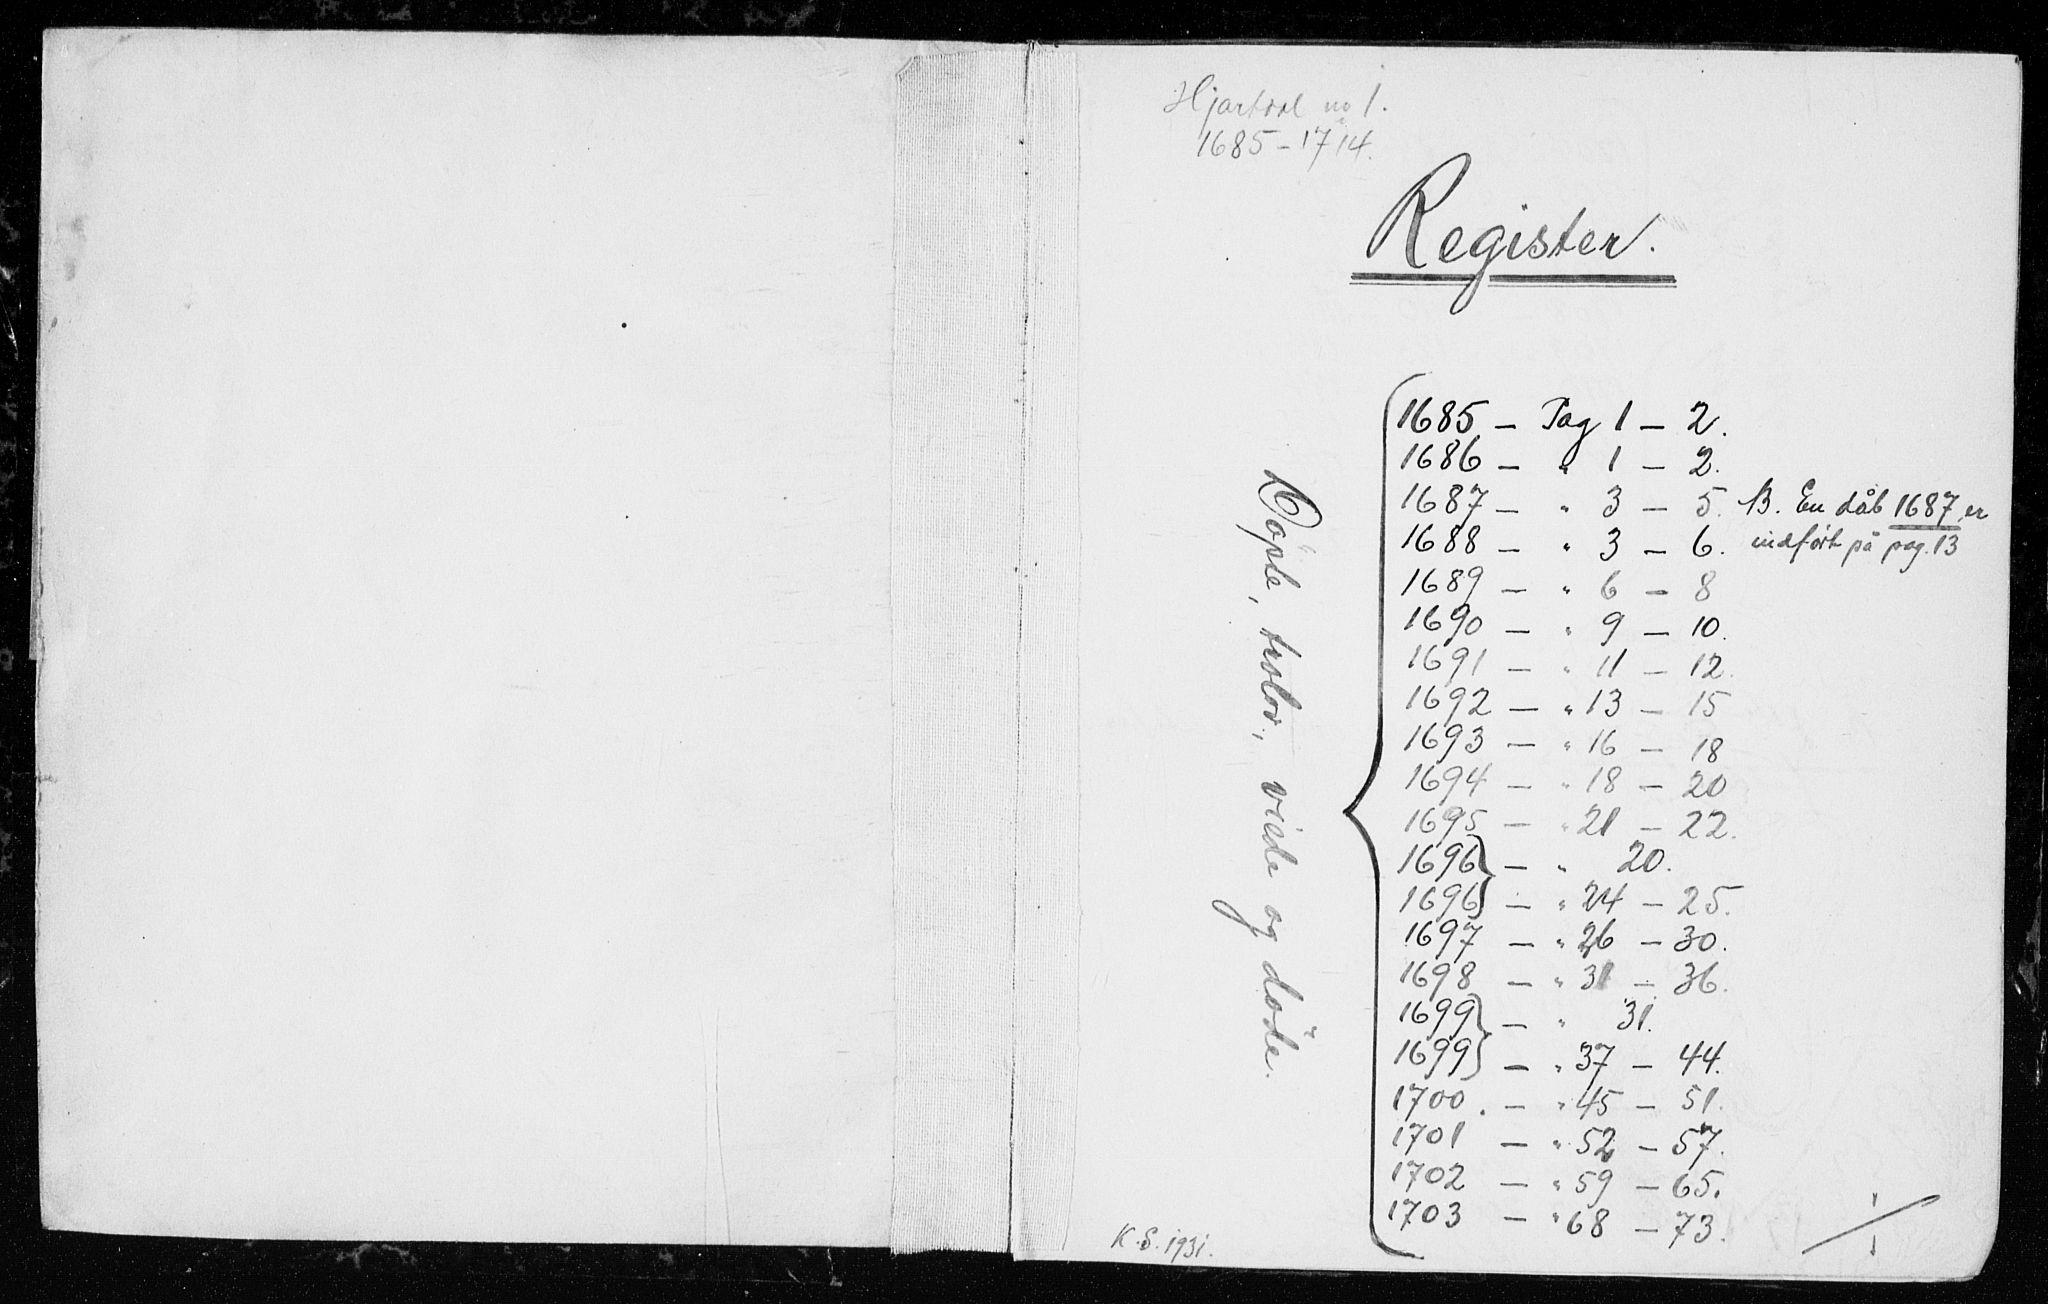 SAKO, Hjartdal kirkebøker, F/Fa/L0001: Ministerialbok nr. I 1, 1685-1714